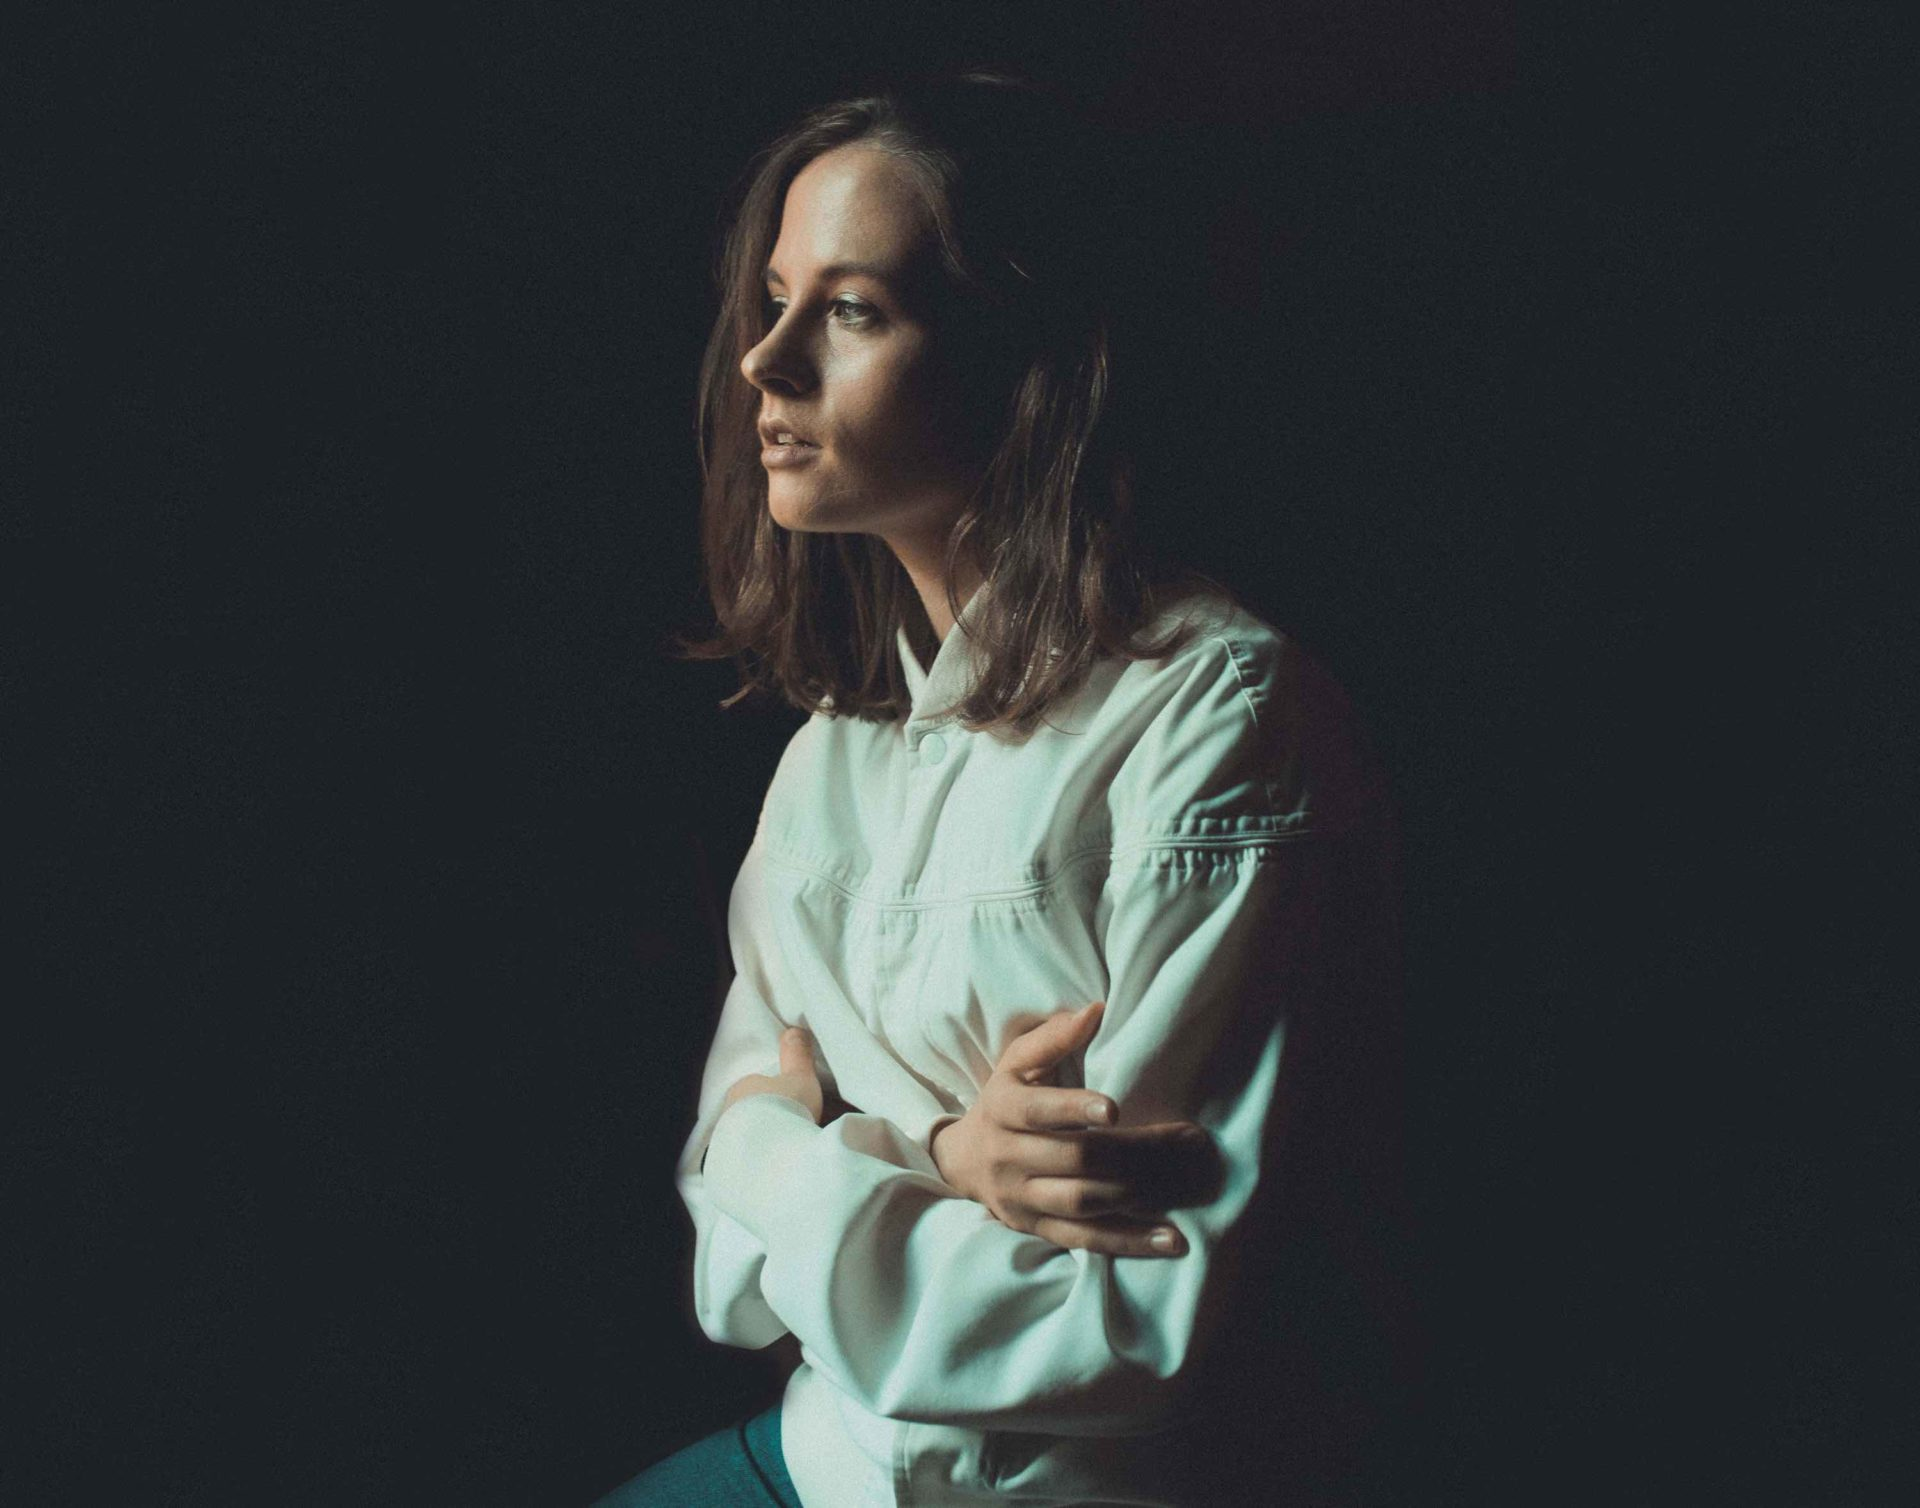 Hania-Rani, fot. Marta Kacprzak, 2021